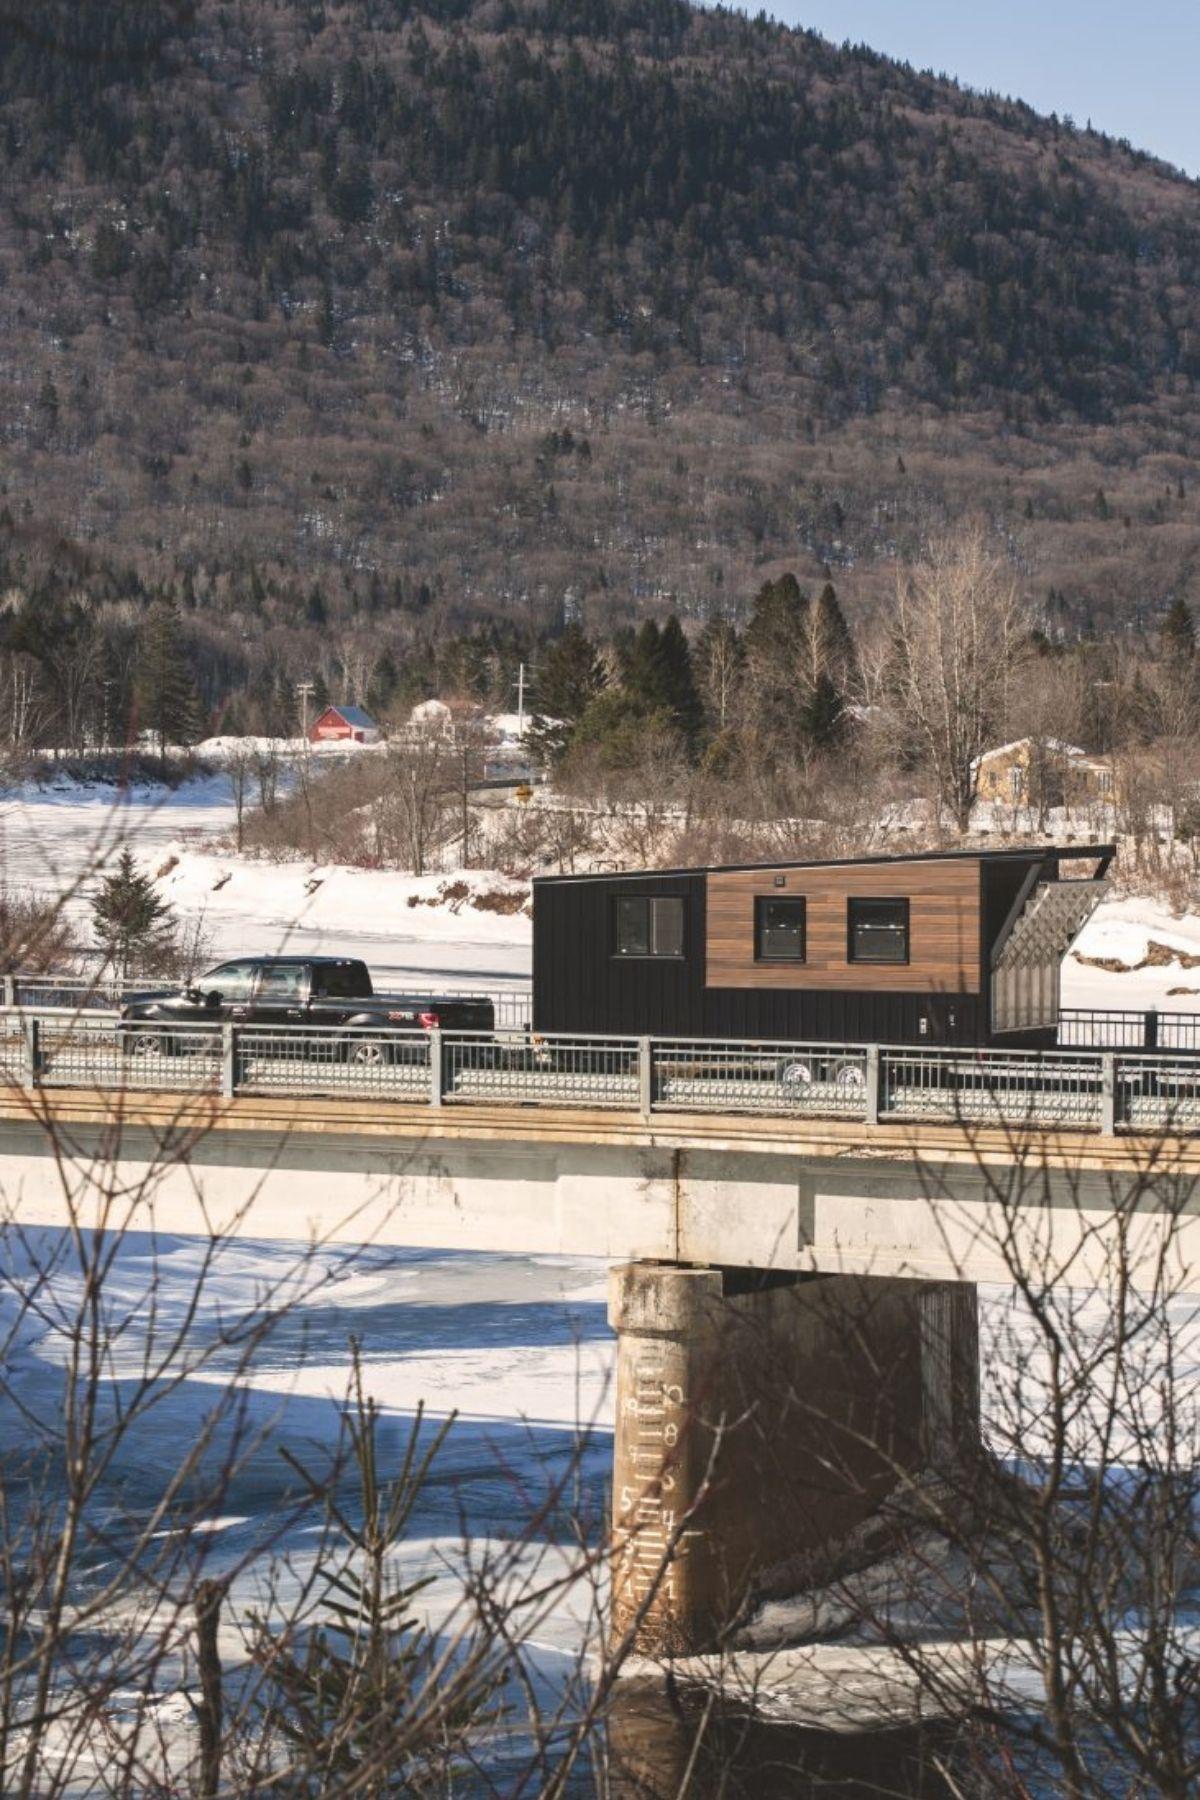 Black truck pulling wood tiny house across bridge